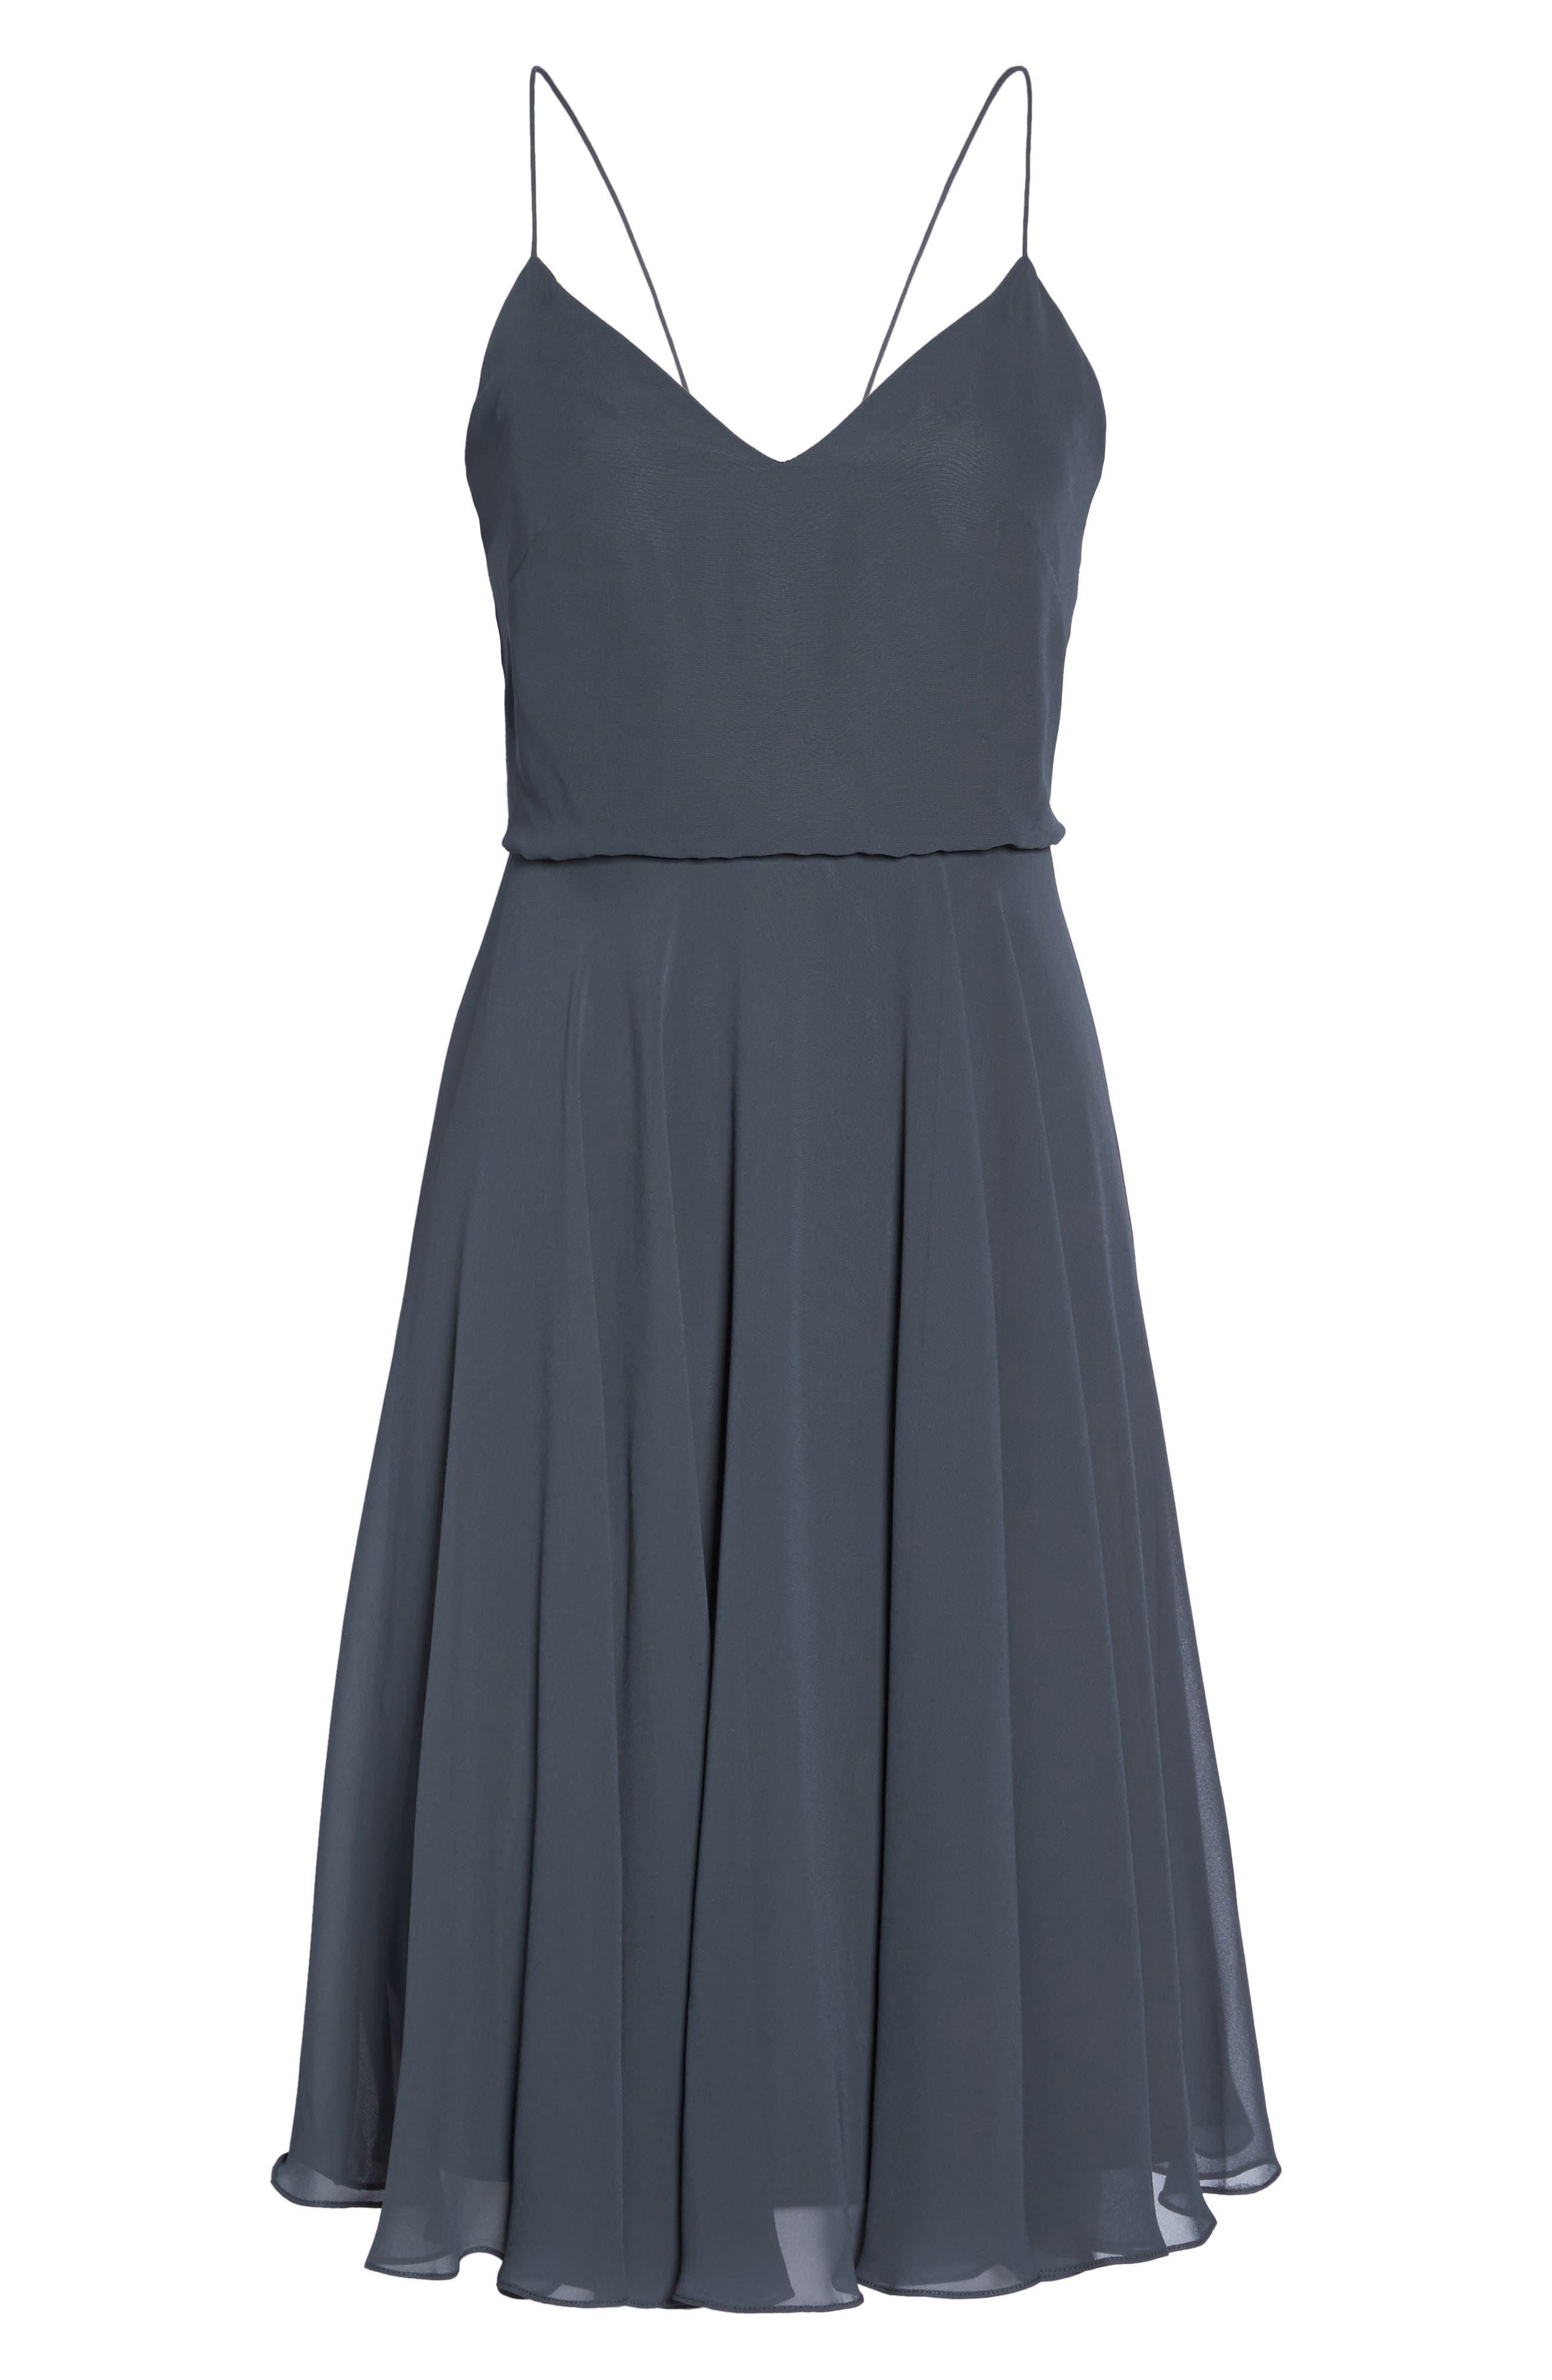 JENNY YOO,                             Sienna Chiffon Dress,                             Alternate thumbnail 6, color,                             026